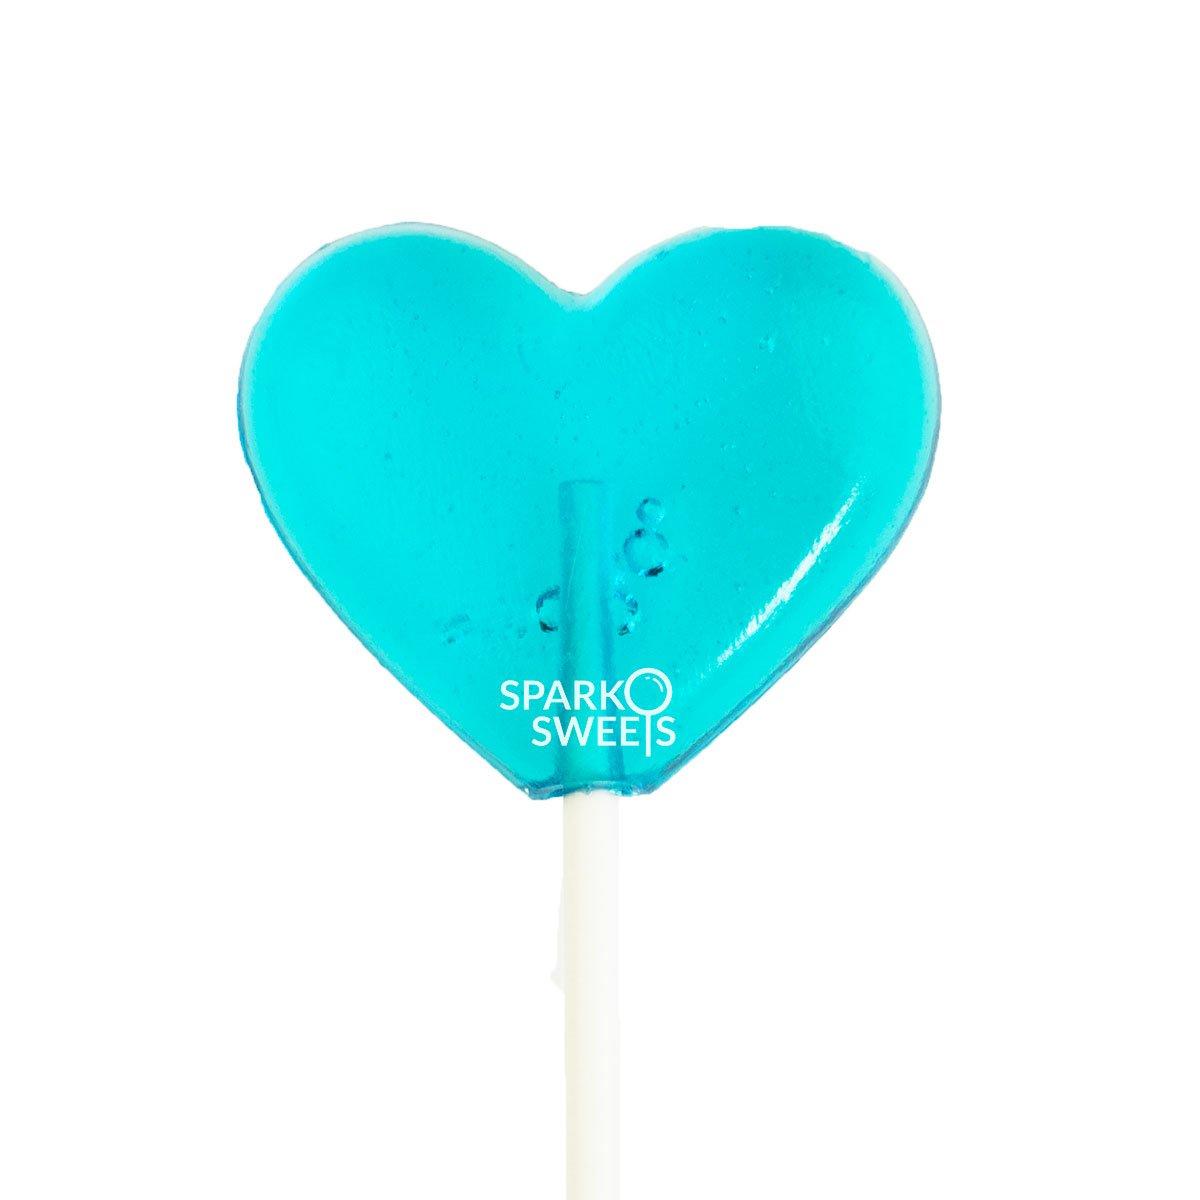 "Baby Blue Heart Lollipops, Blue Raspberry Flavor, 2"" Diameter Lollipop, Handcrafted Fresh in USA, 24 Pieces"